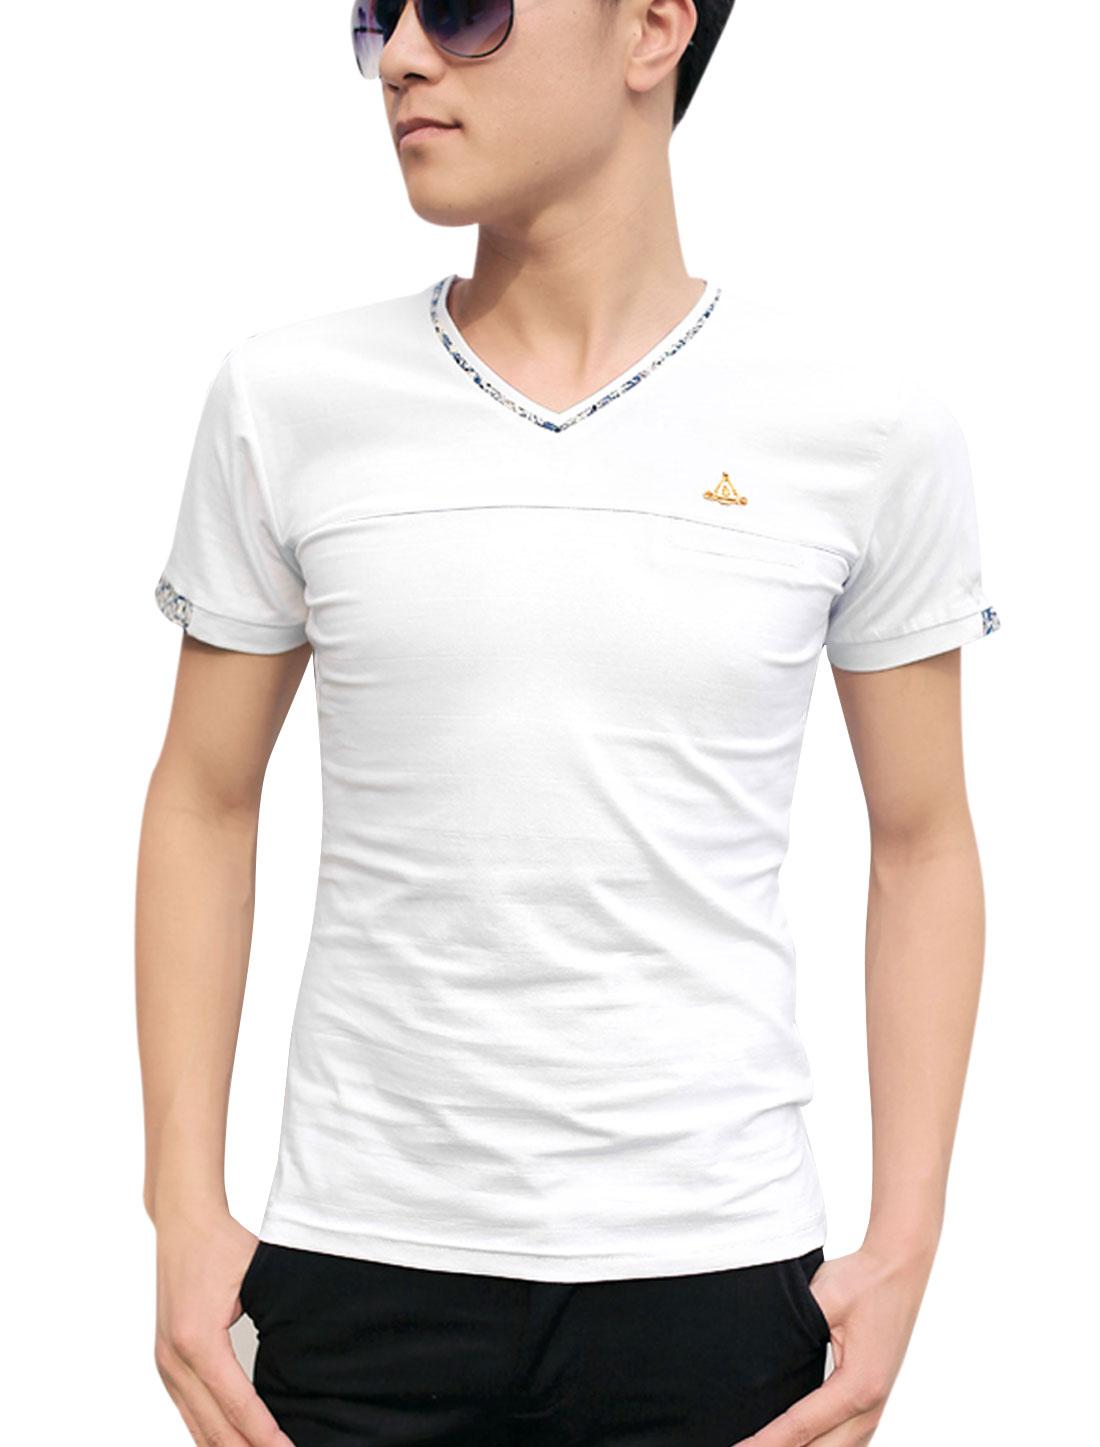 Men V Neck Short Sleeve Mock Welt Pocket Stylish T-Shirt White M